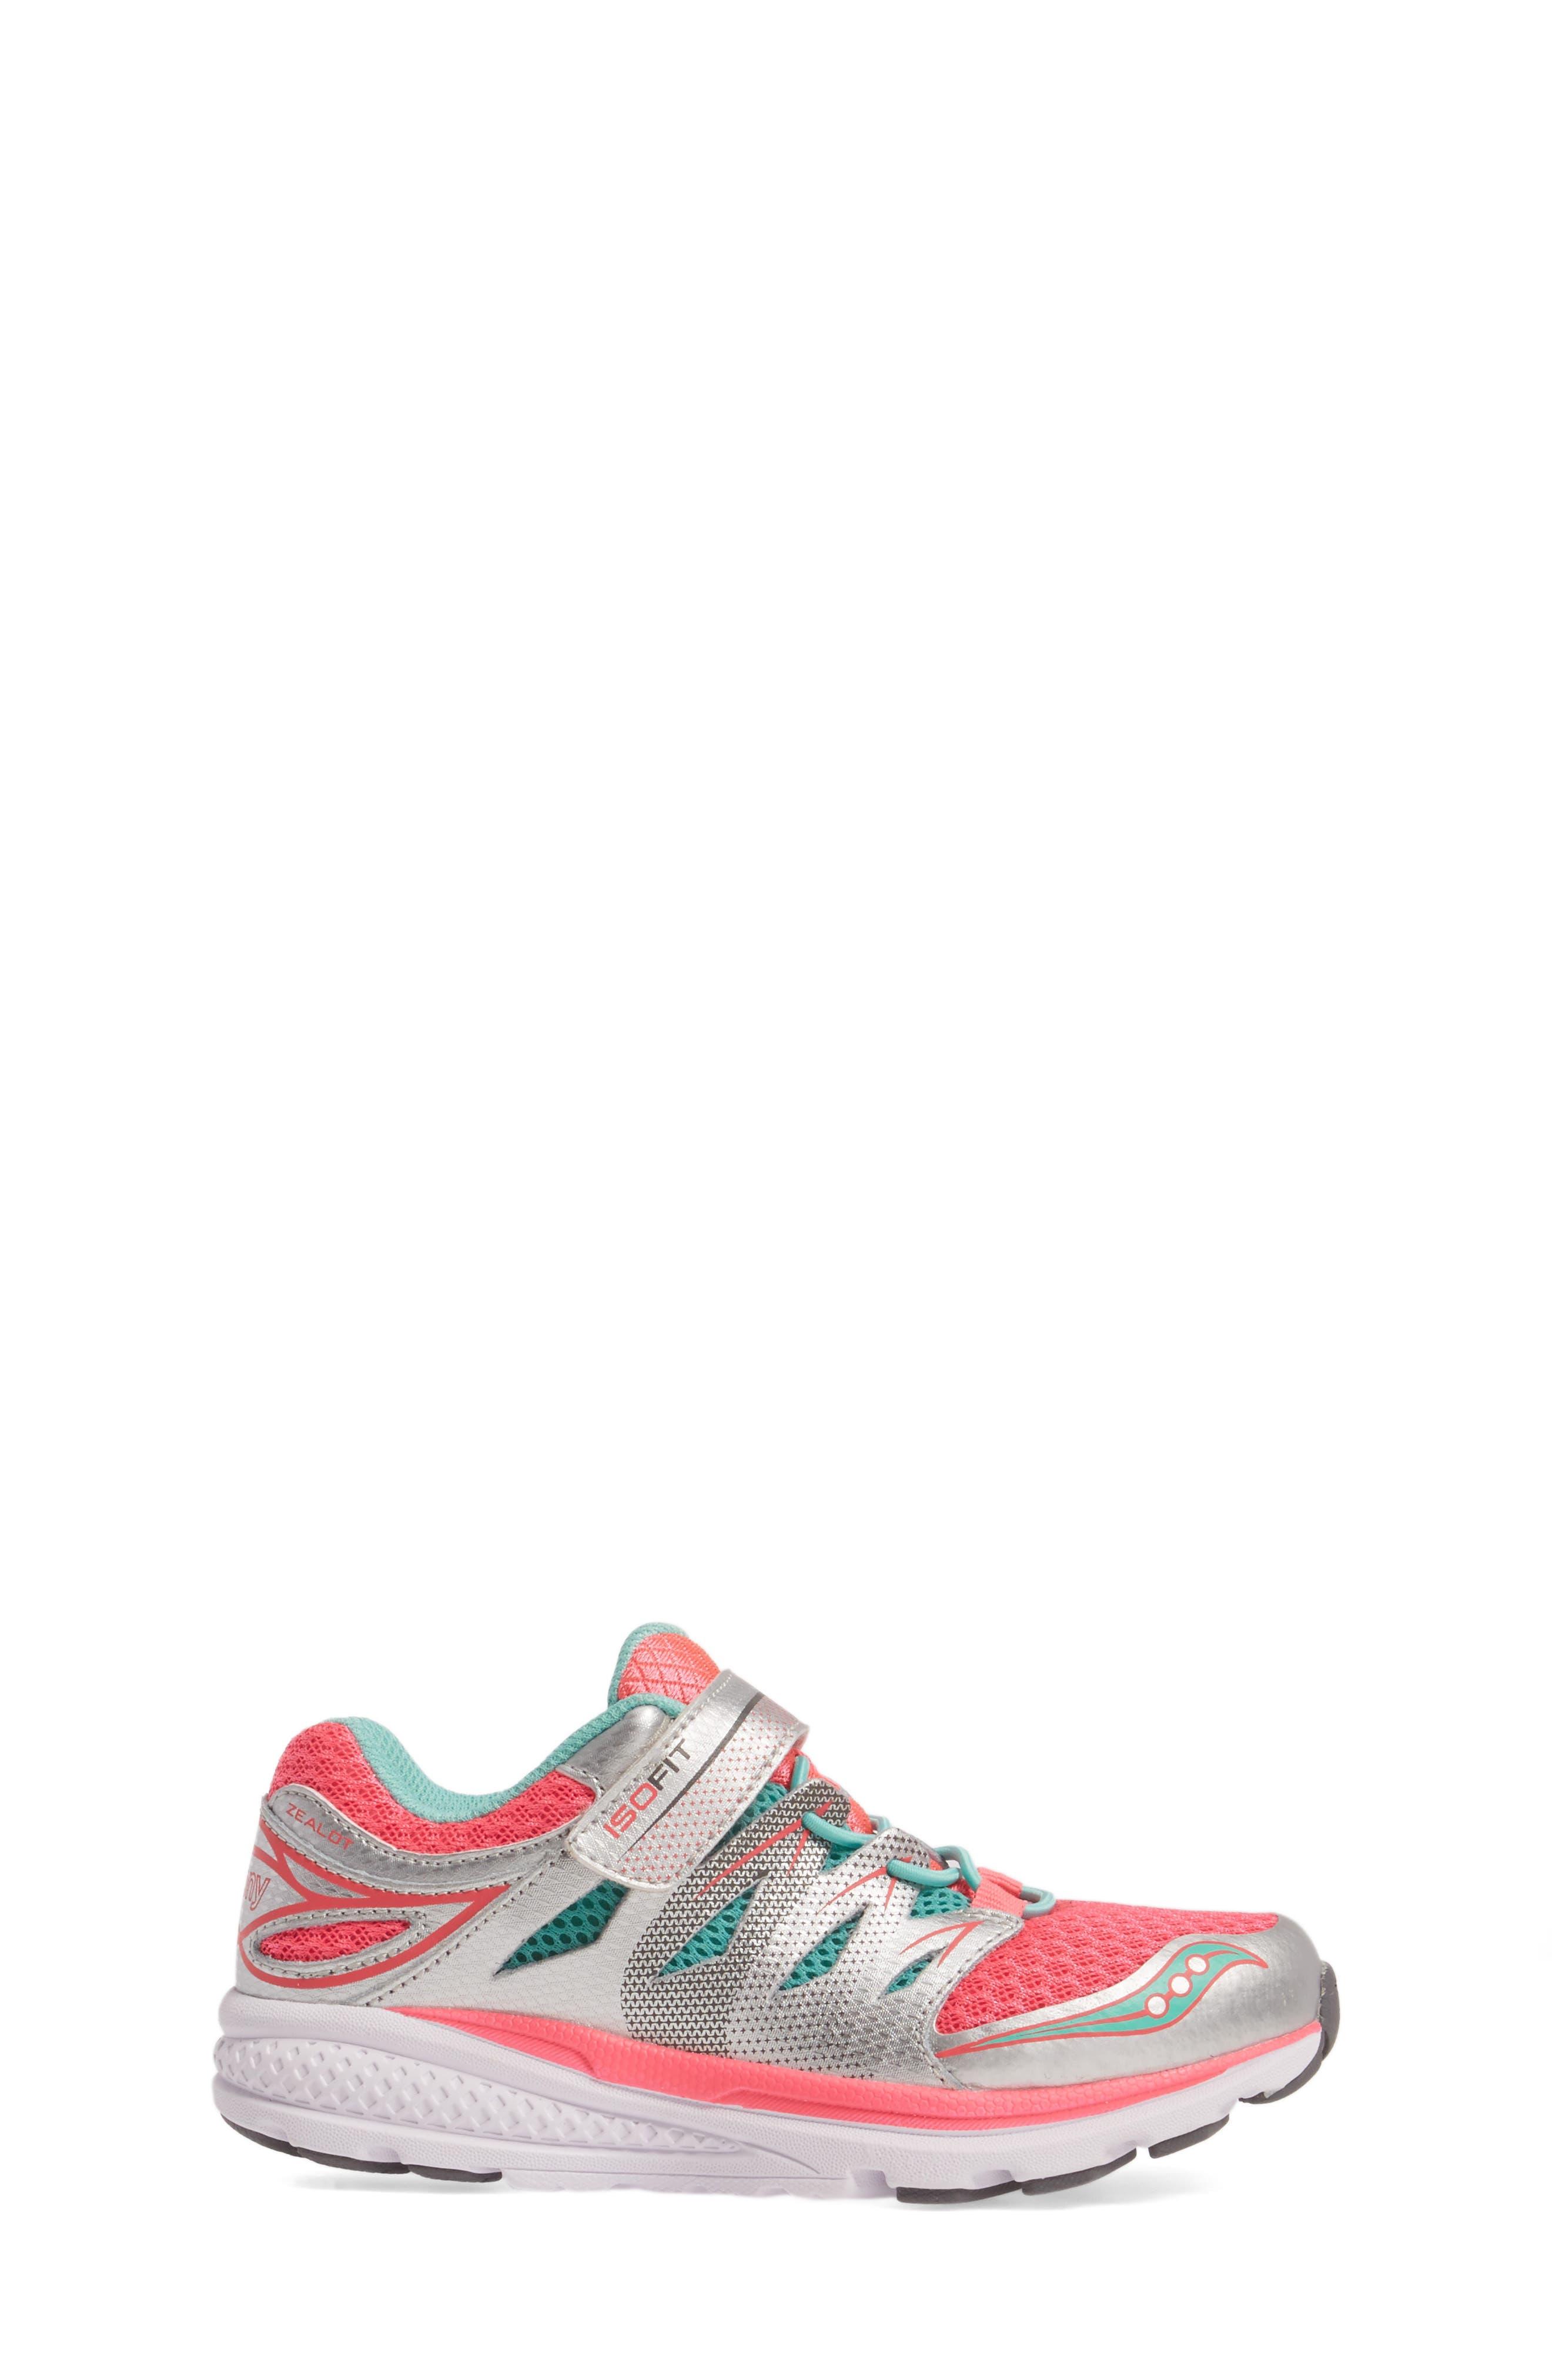 Alternate Image 3  - Saucony Zealot 2 A/C Sneaker (Toddler & Little Kid)